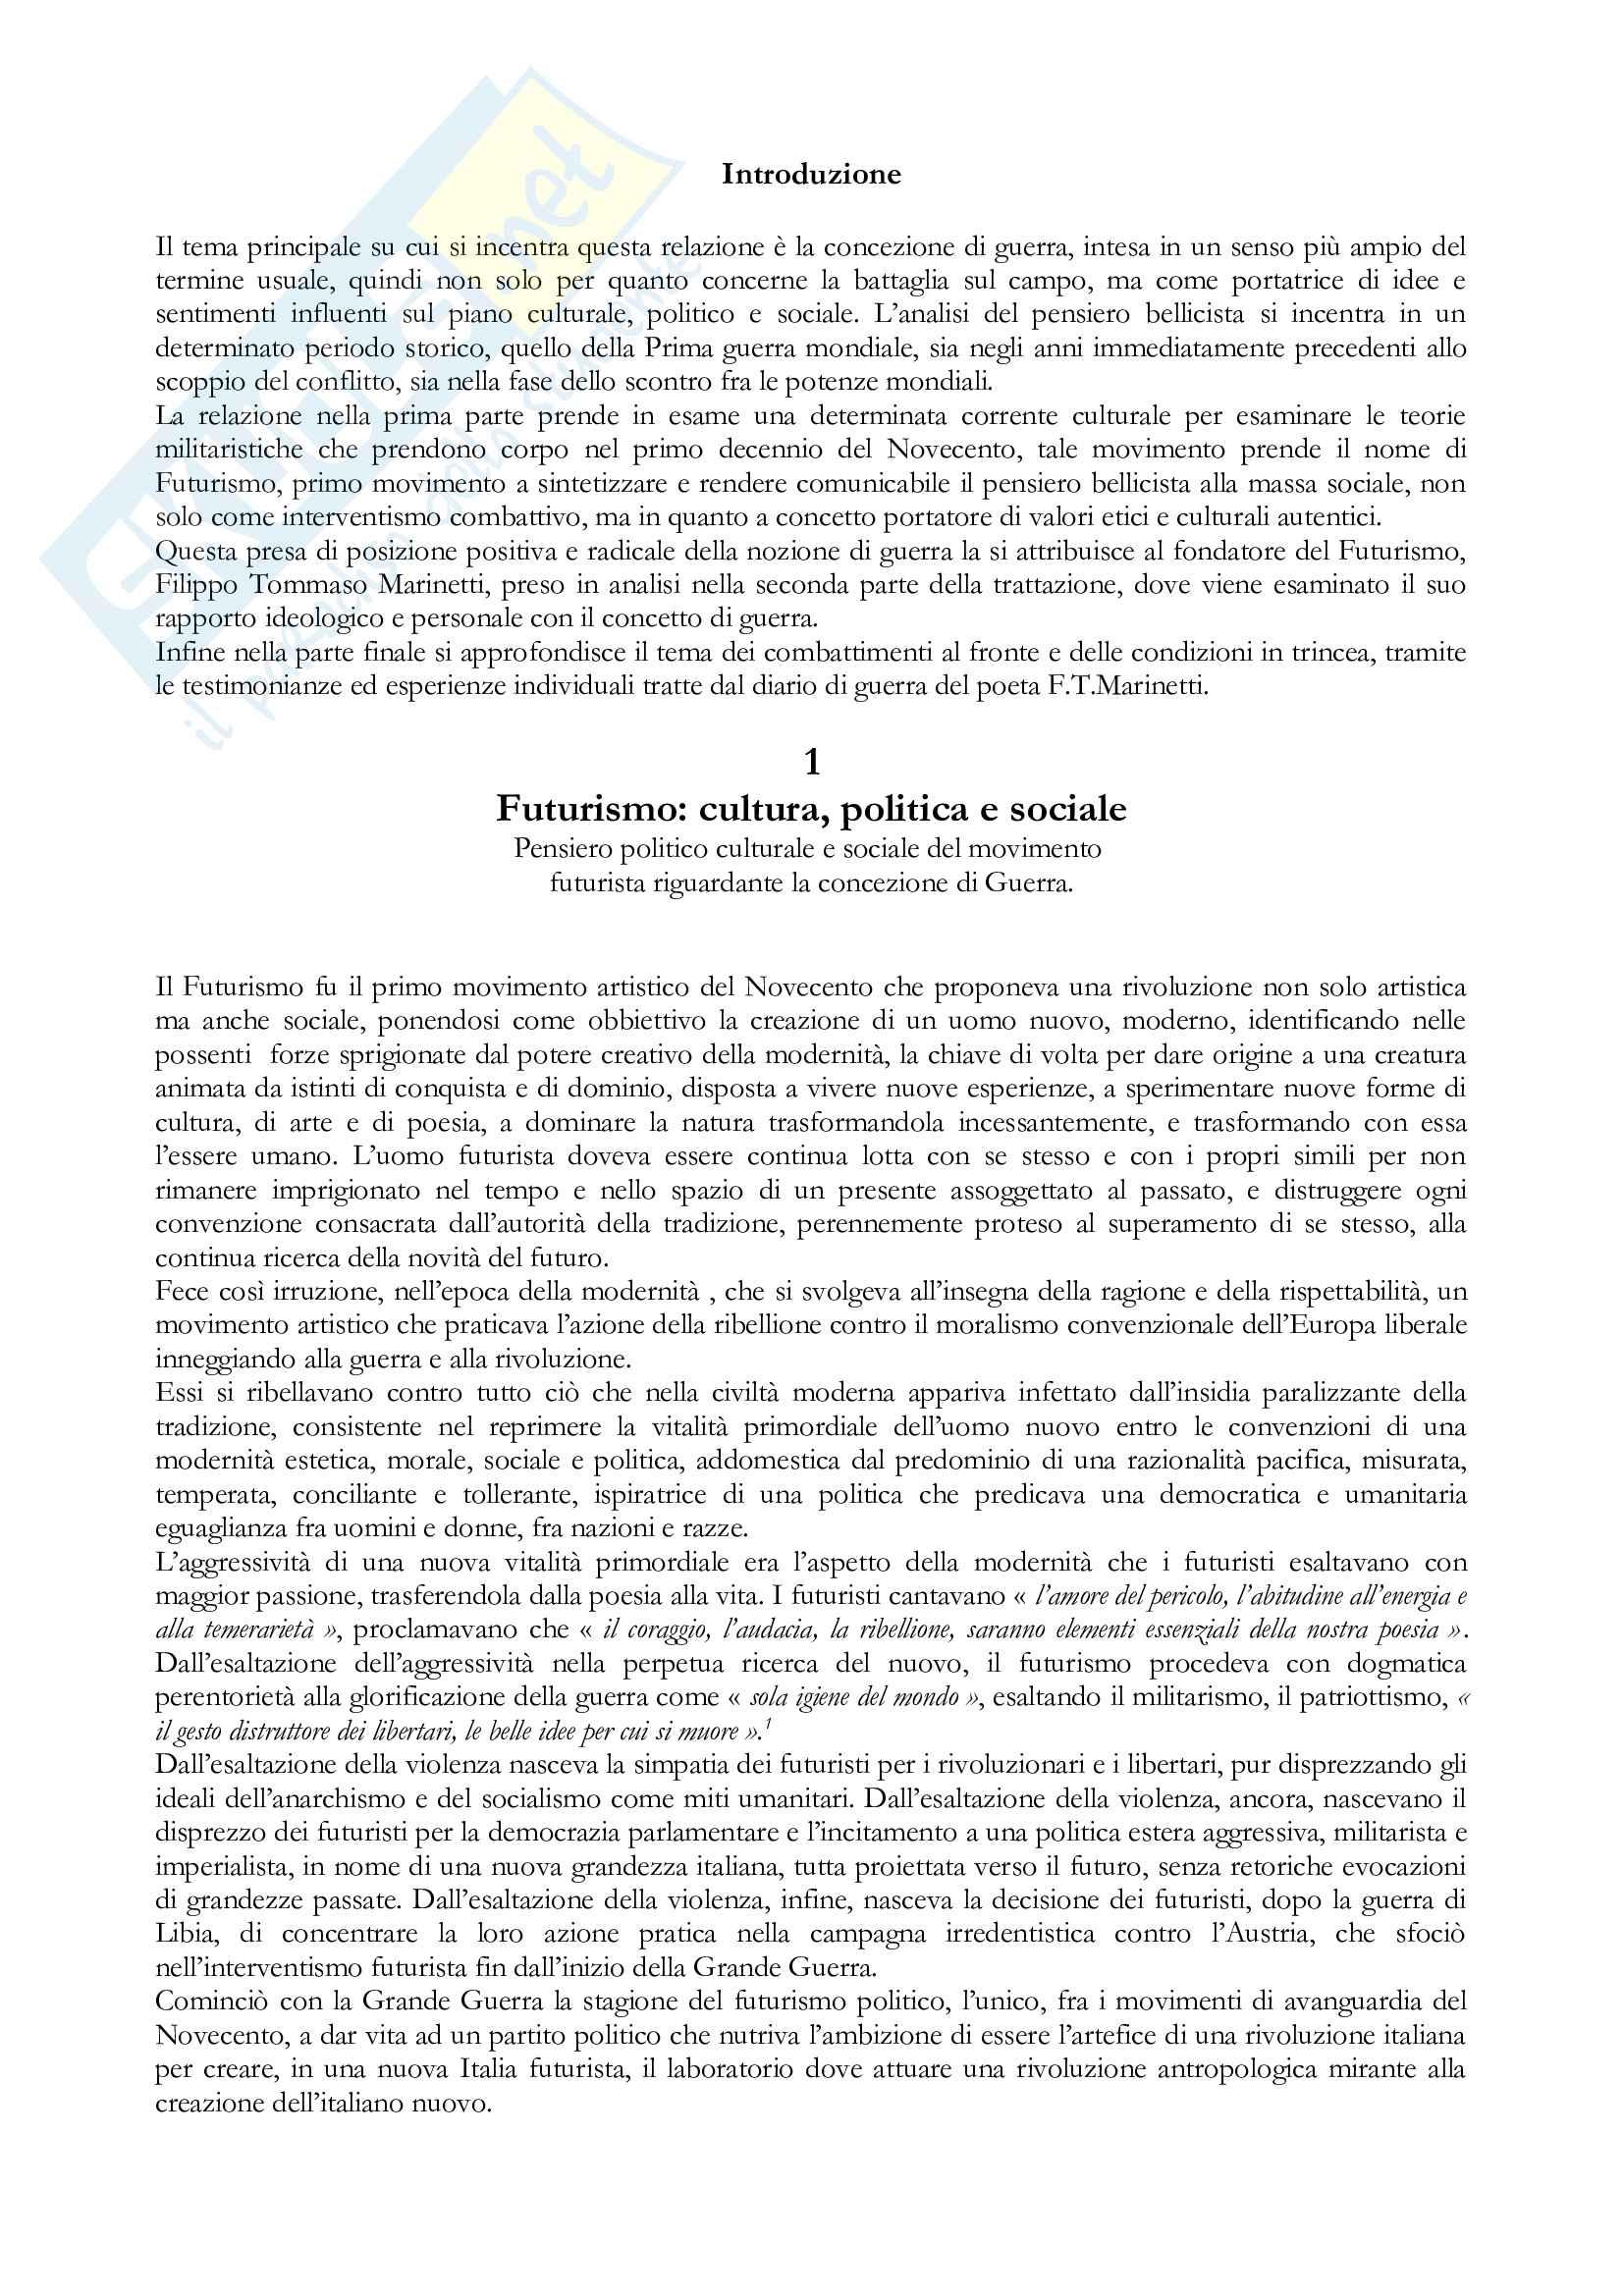 Tesi Futurismo e Filippo Tommaso Marinetti Pag. 2